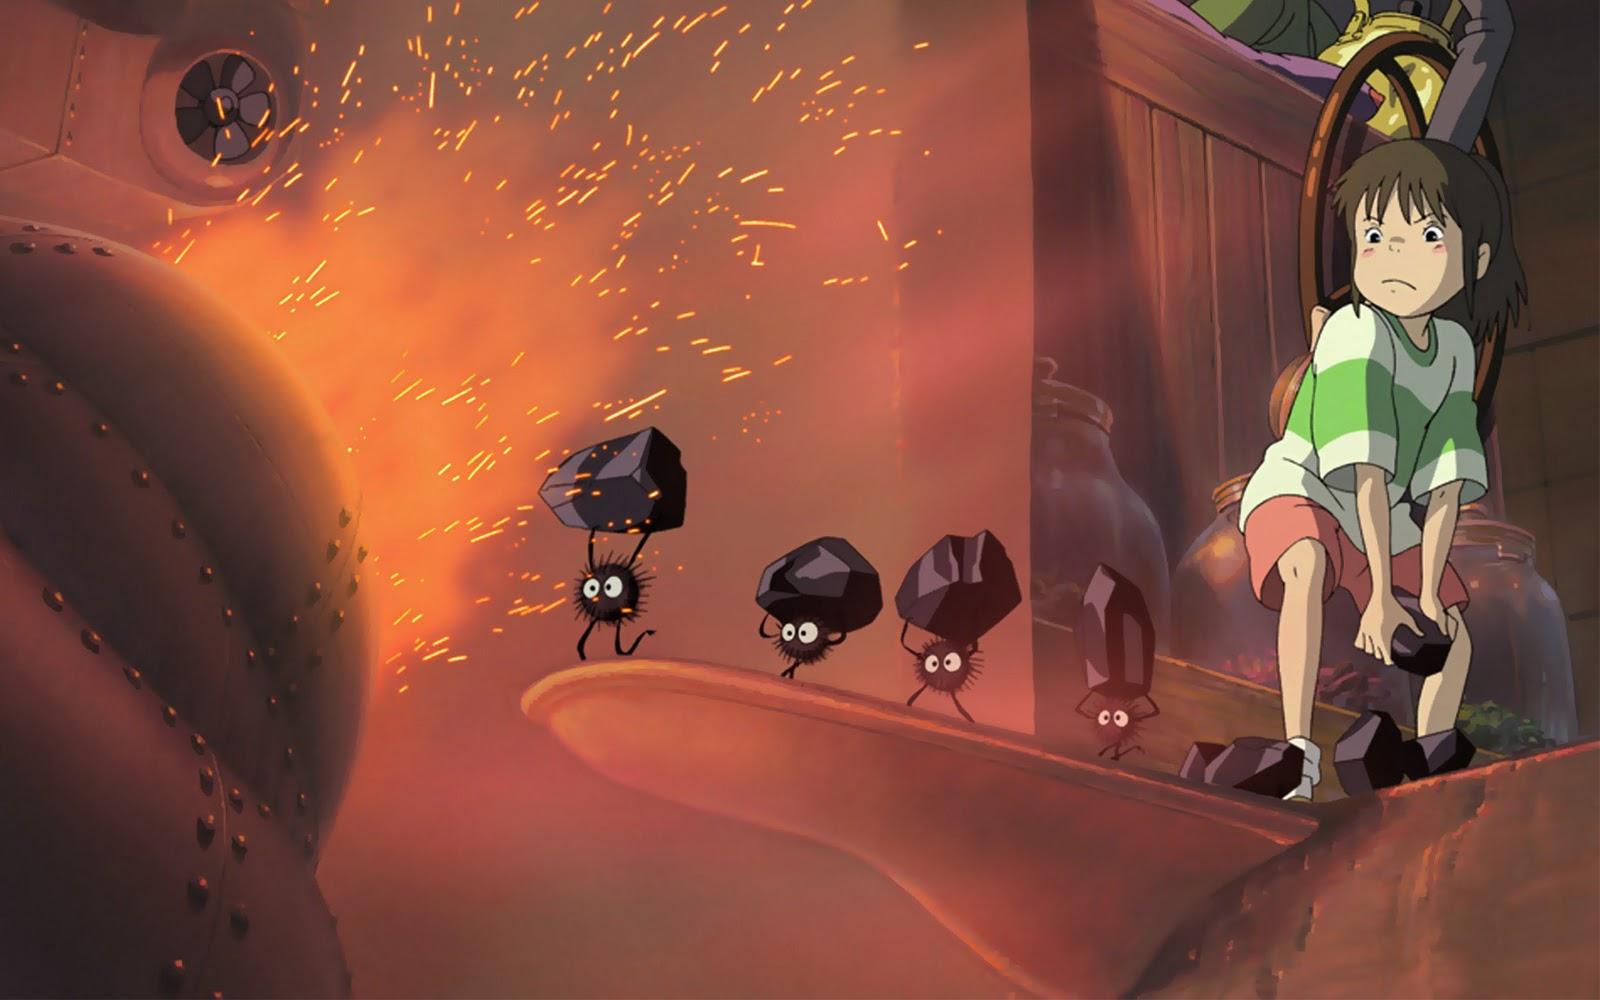 Spiriting Away Animation Poster HD Wallpapers ~ Cartoon Wallpapers